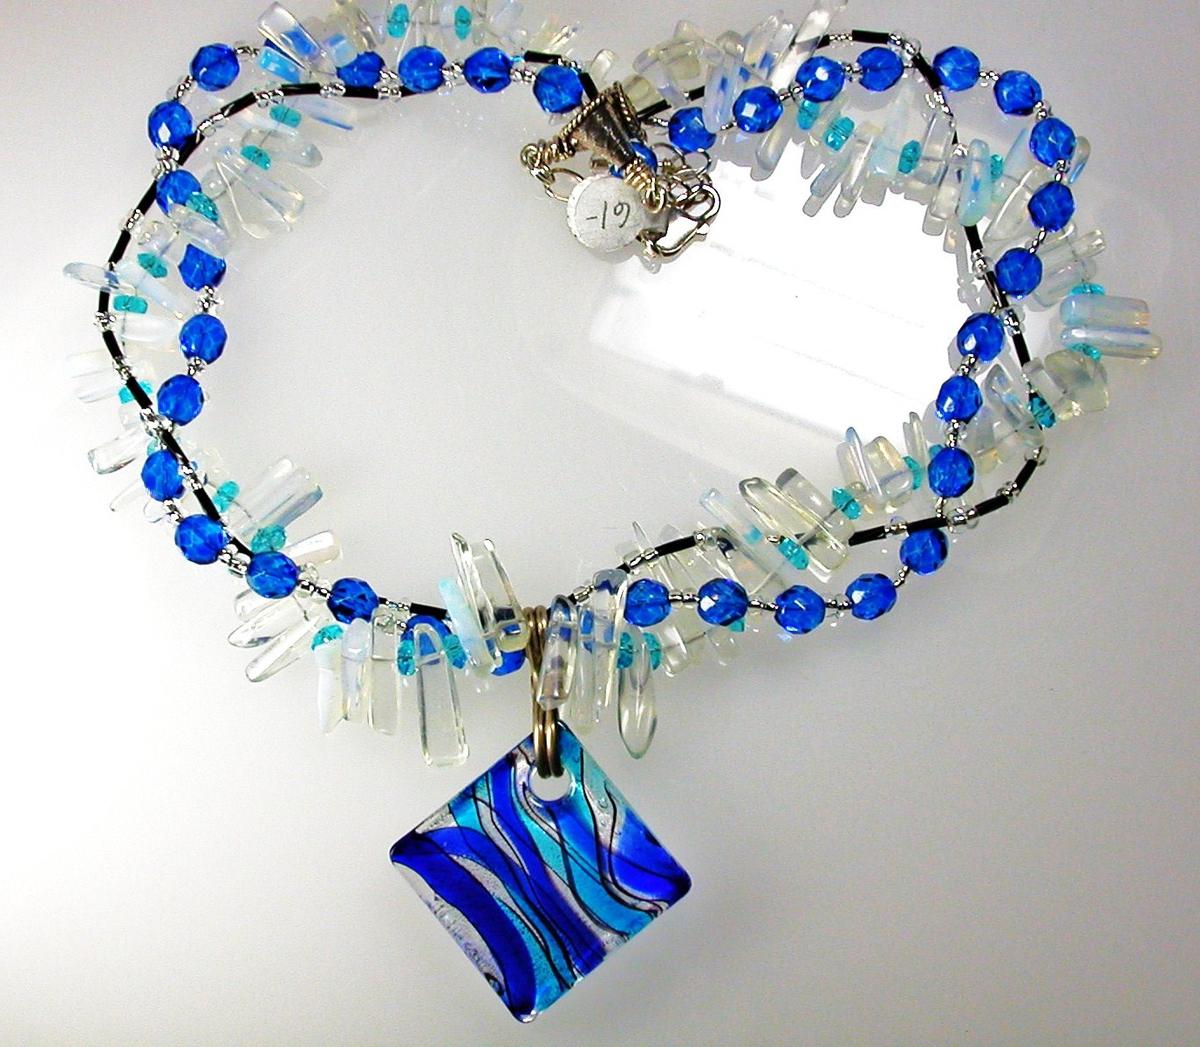 Orinoco Swirl Necklace (large view)